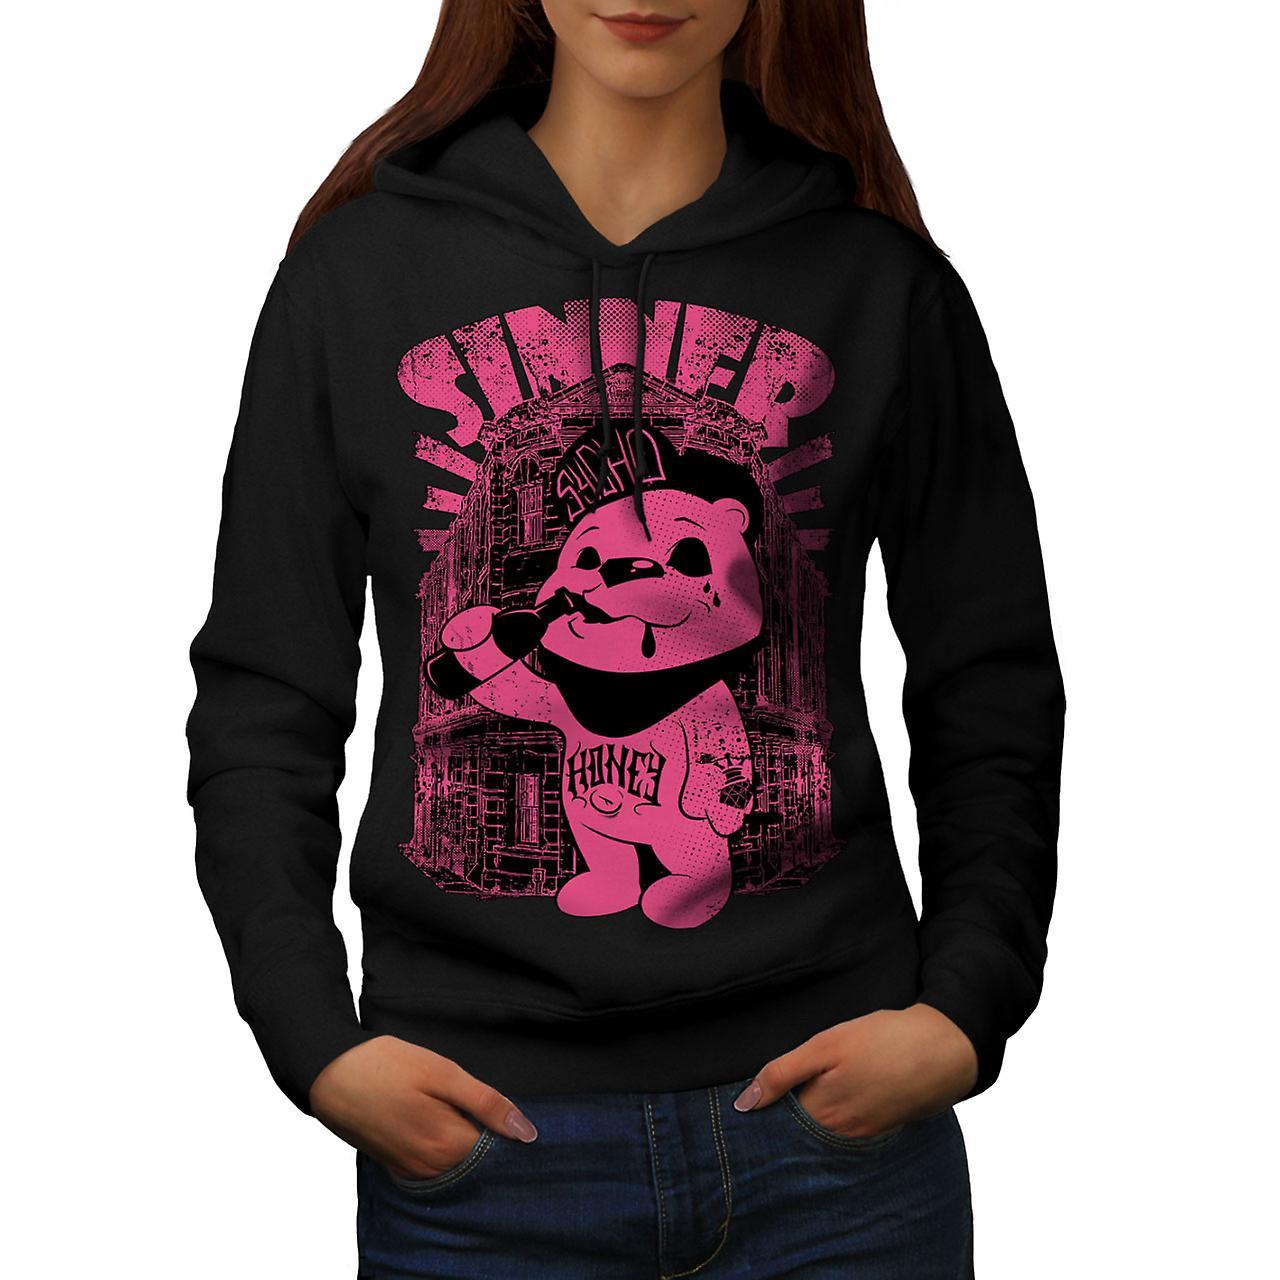 Sinner Teddy Ted Bear Women Black Hoodie | Wellcoda